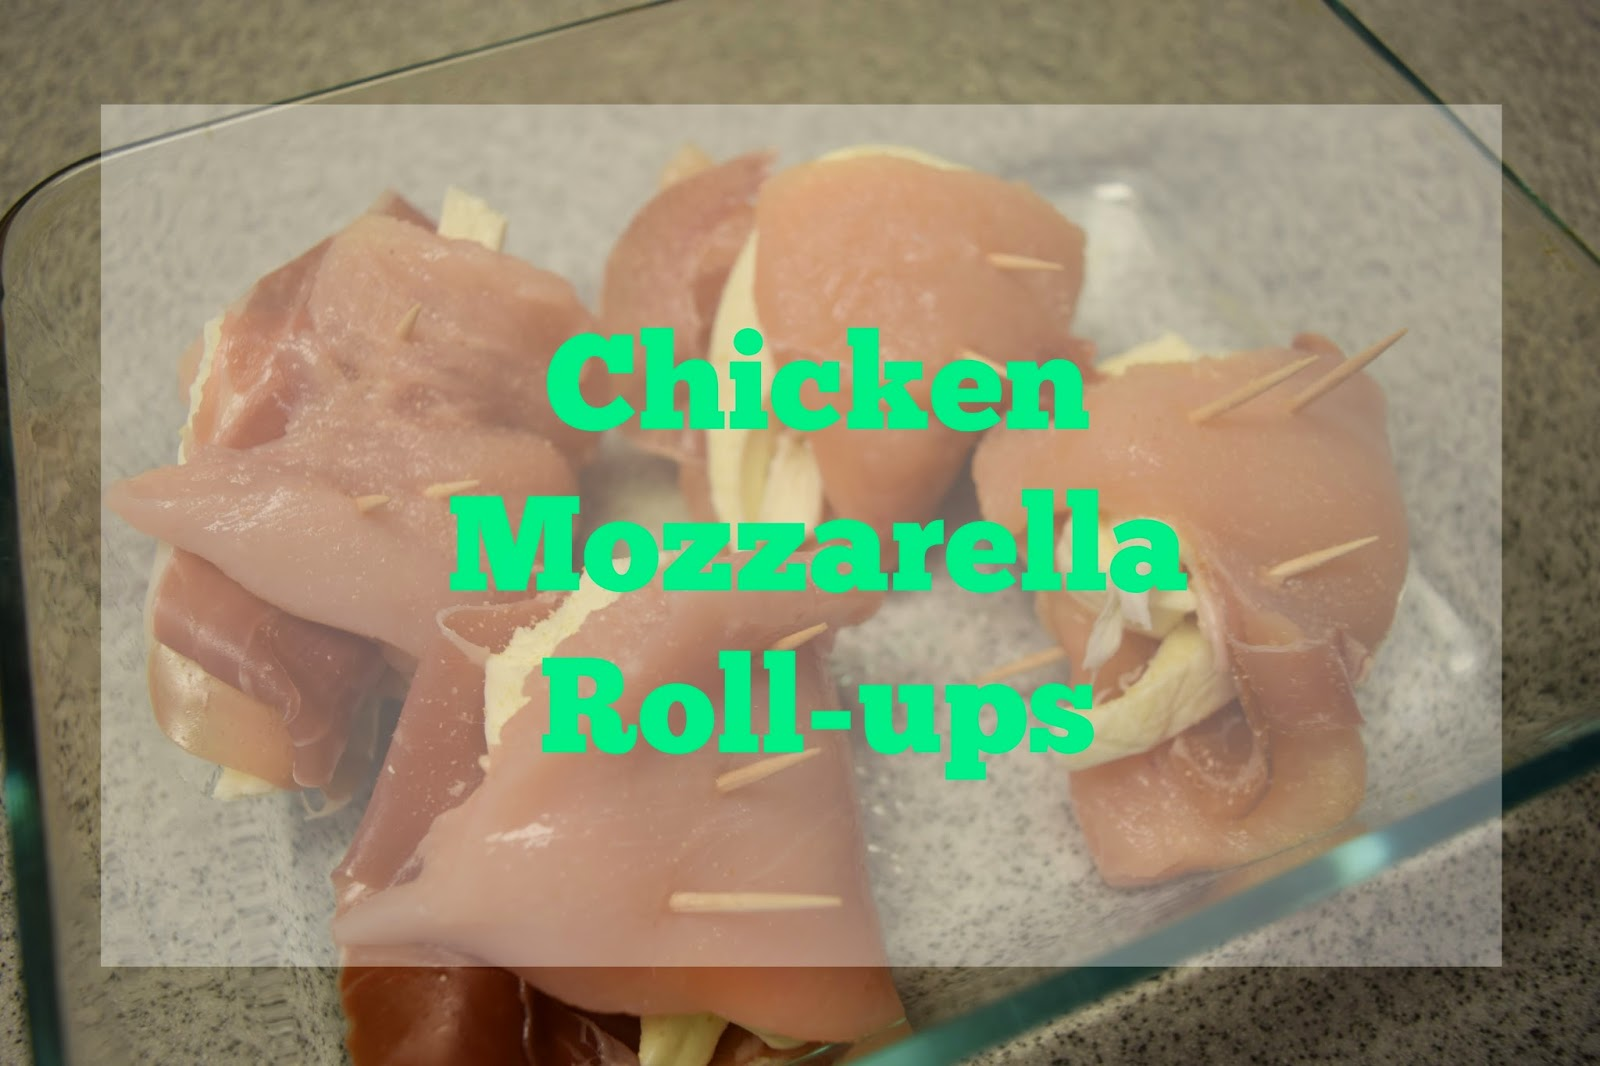 Chicken Mozzarella Roll-ups